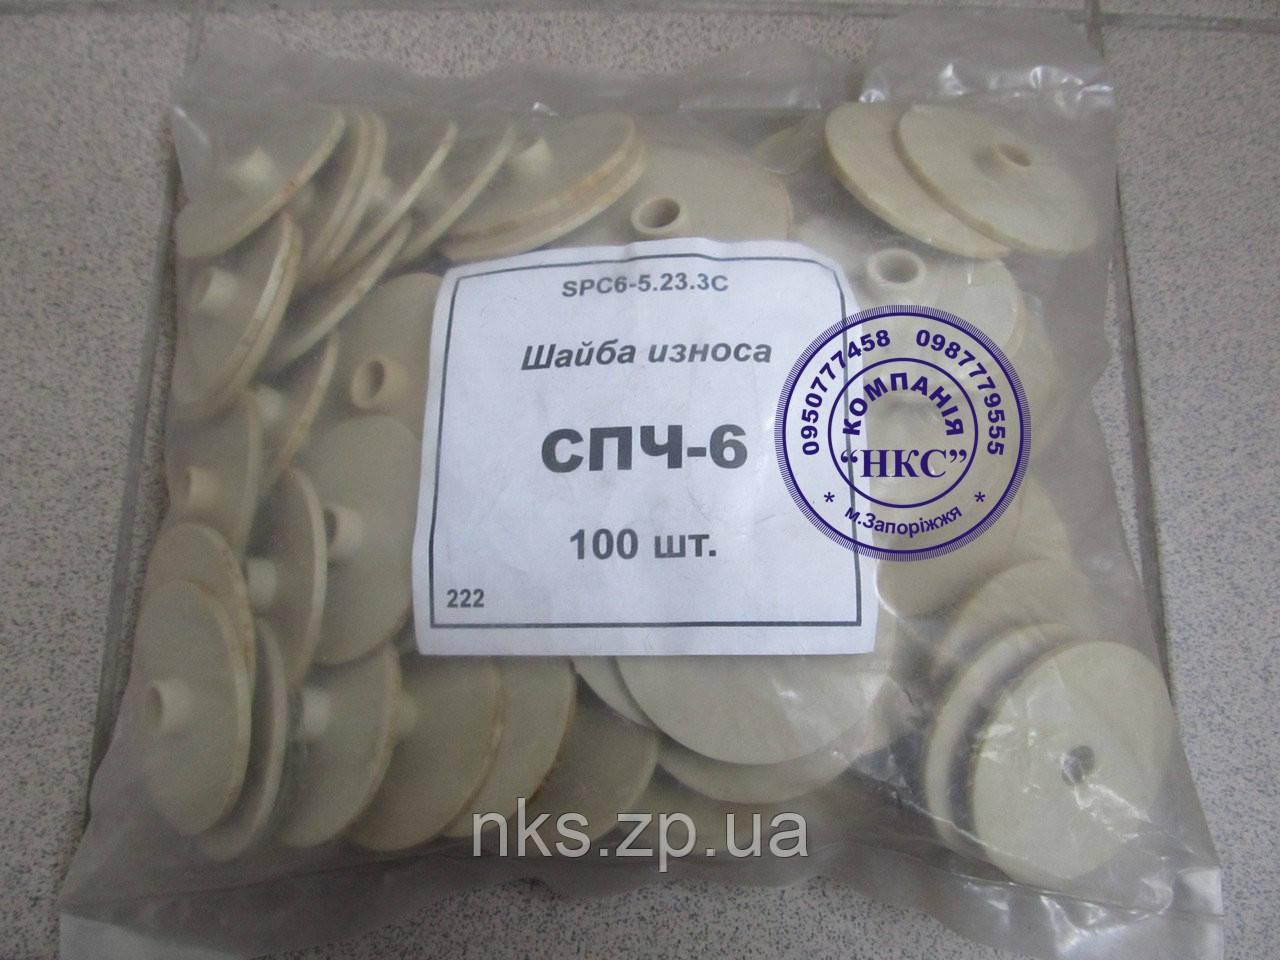 Шайба износа СПЧ-6 100 шт